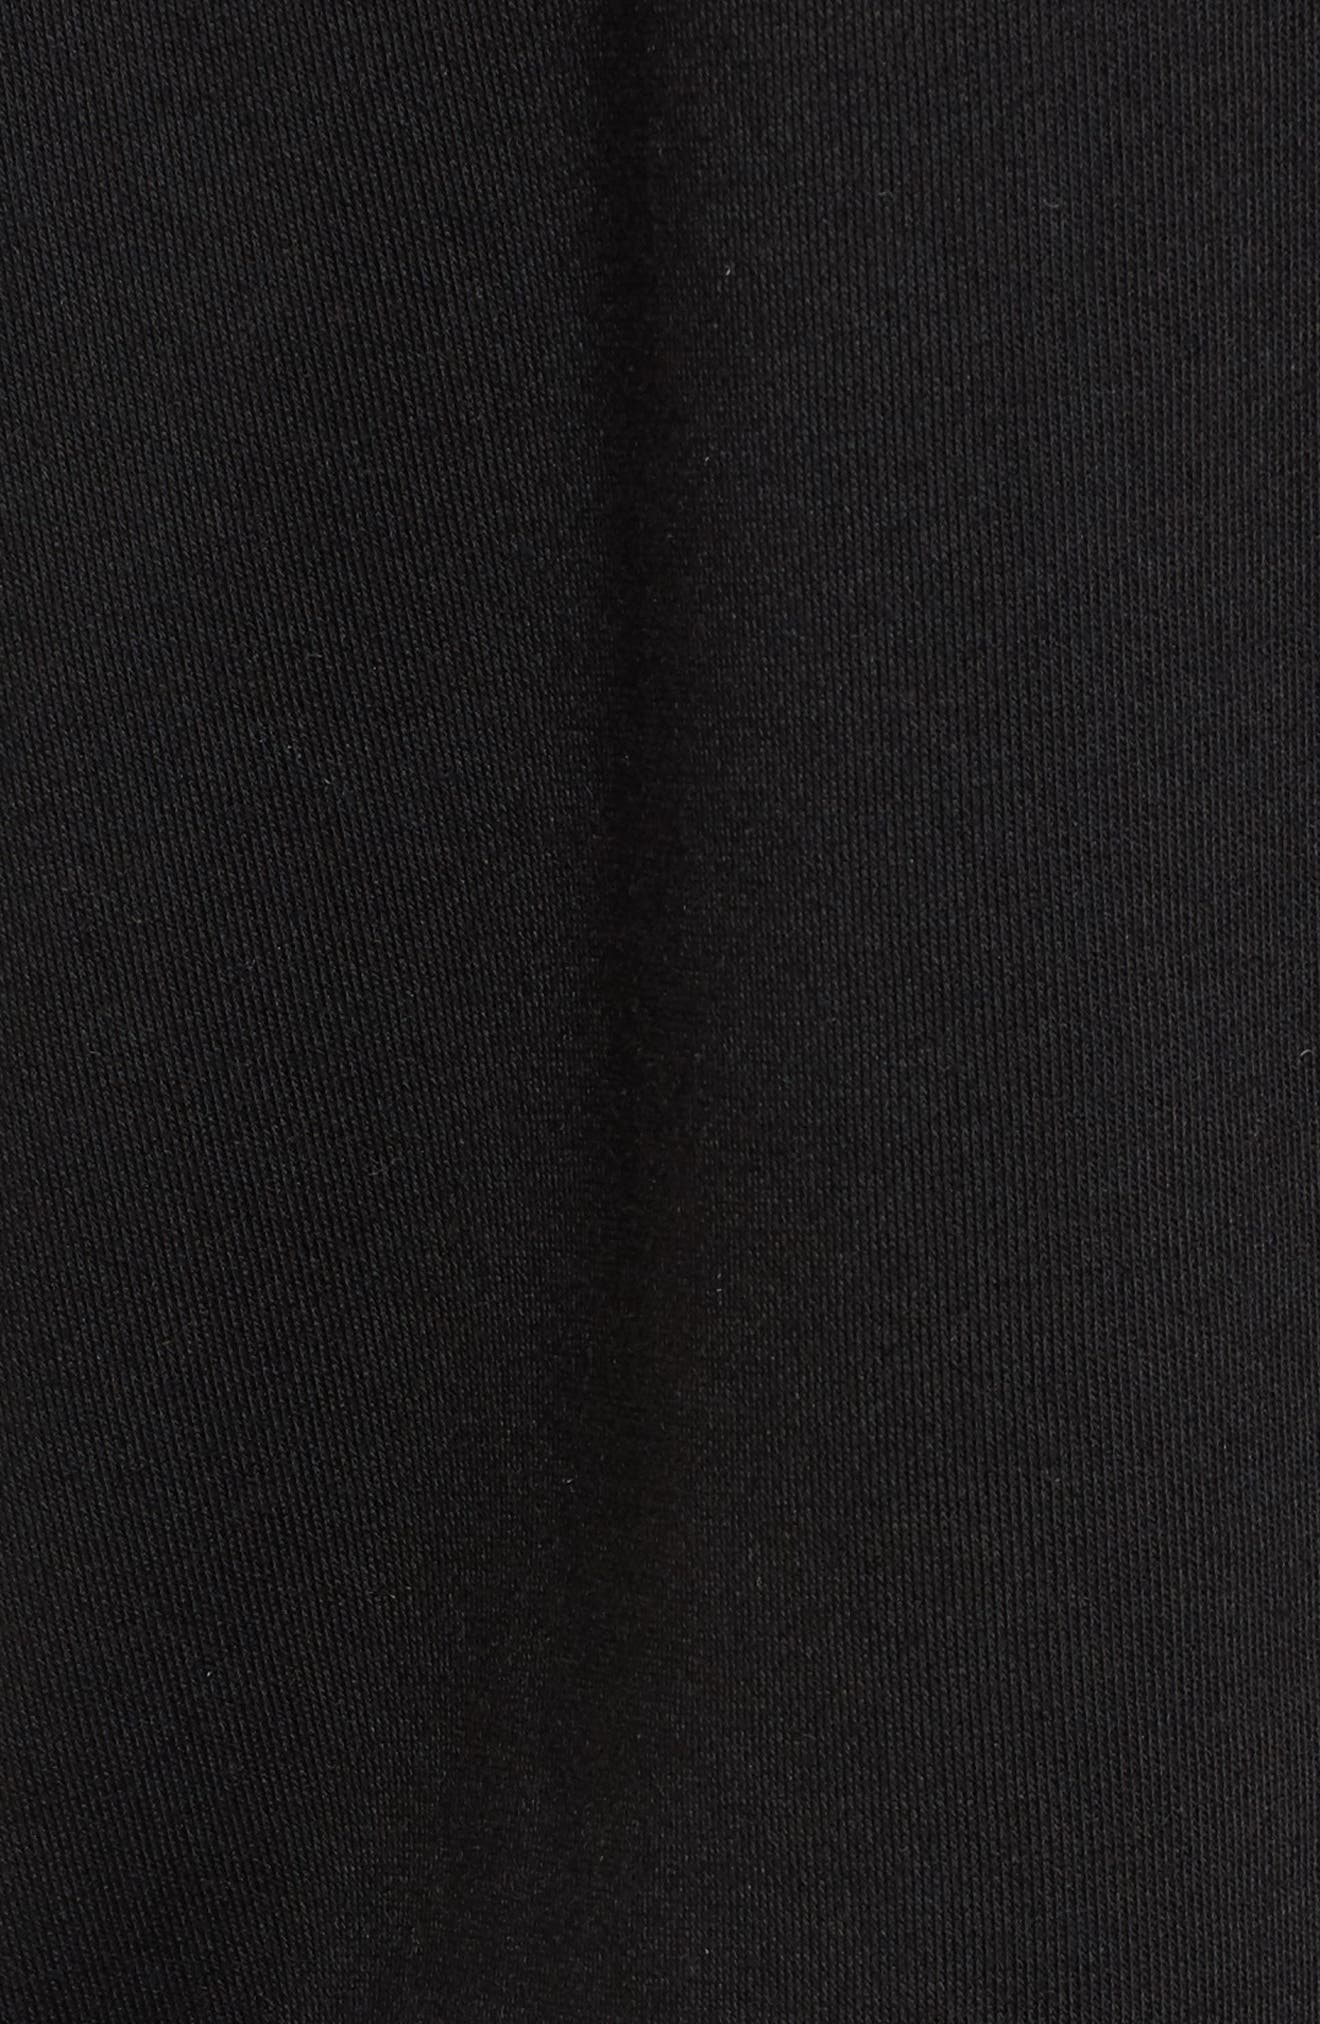 One-Shoulder Ruffle Sweatshirt,                             Alternate thumbnail 5, color,                             001